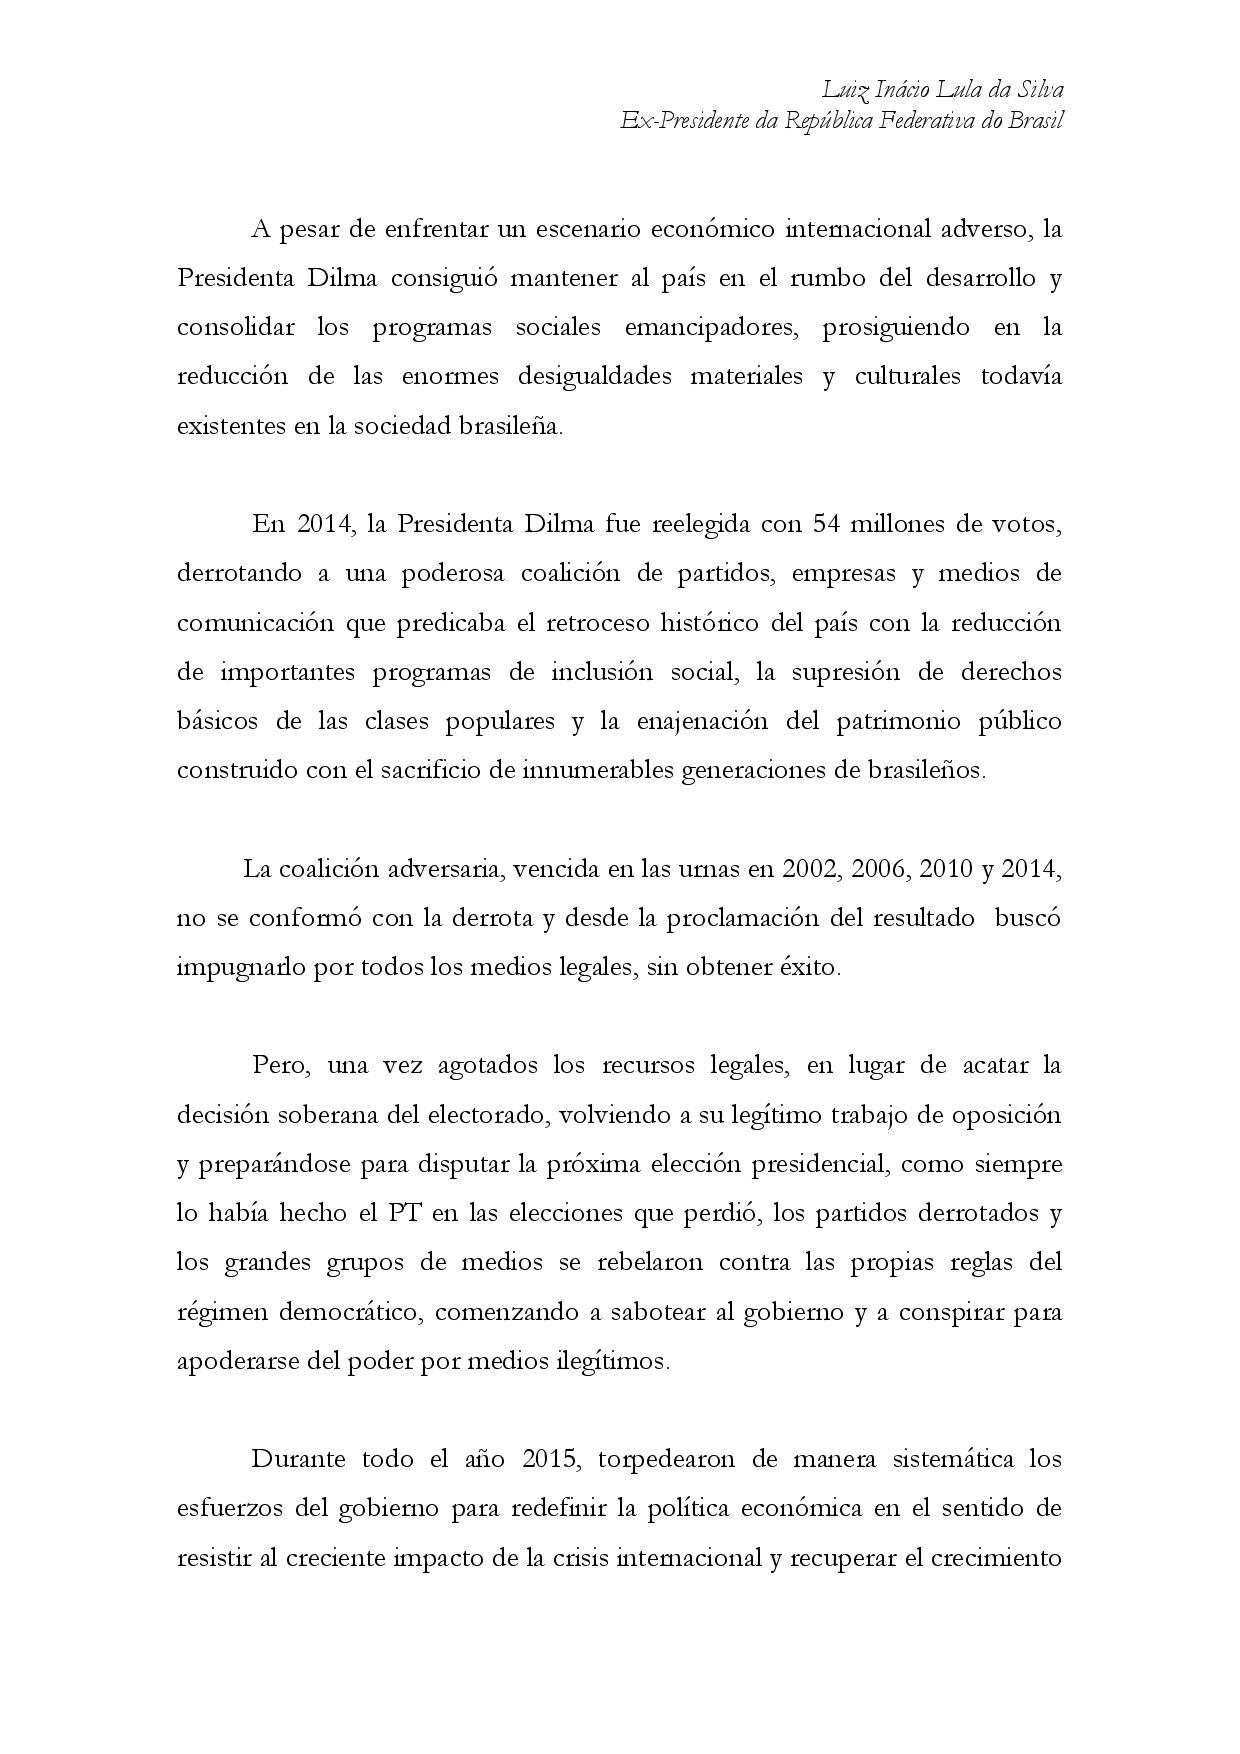 Argentina Ex-presidenta-page-002